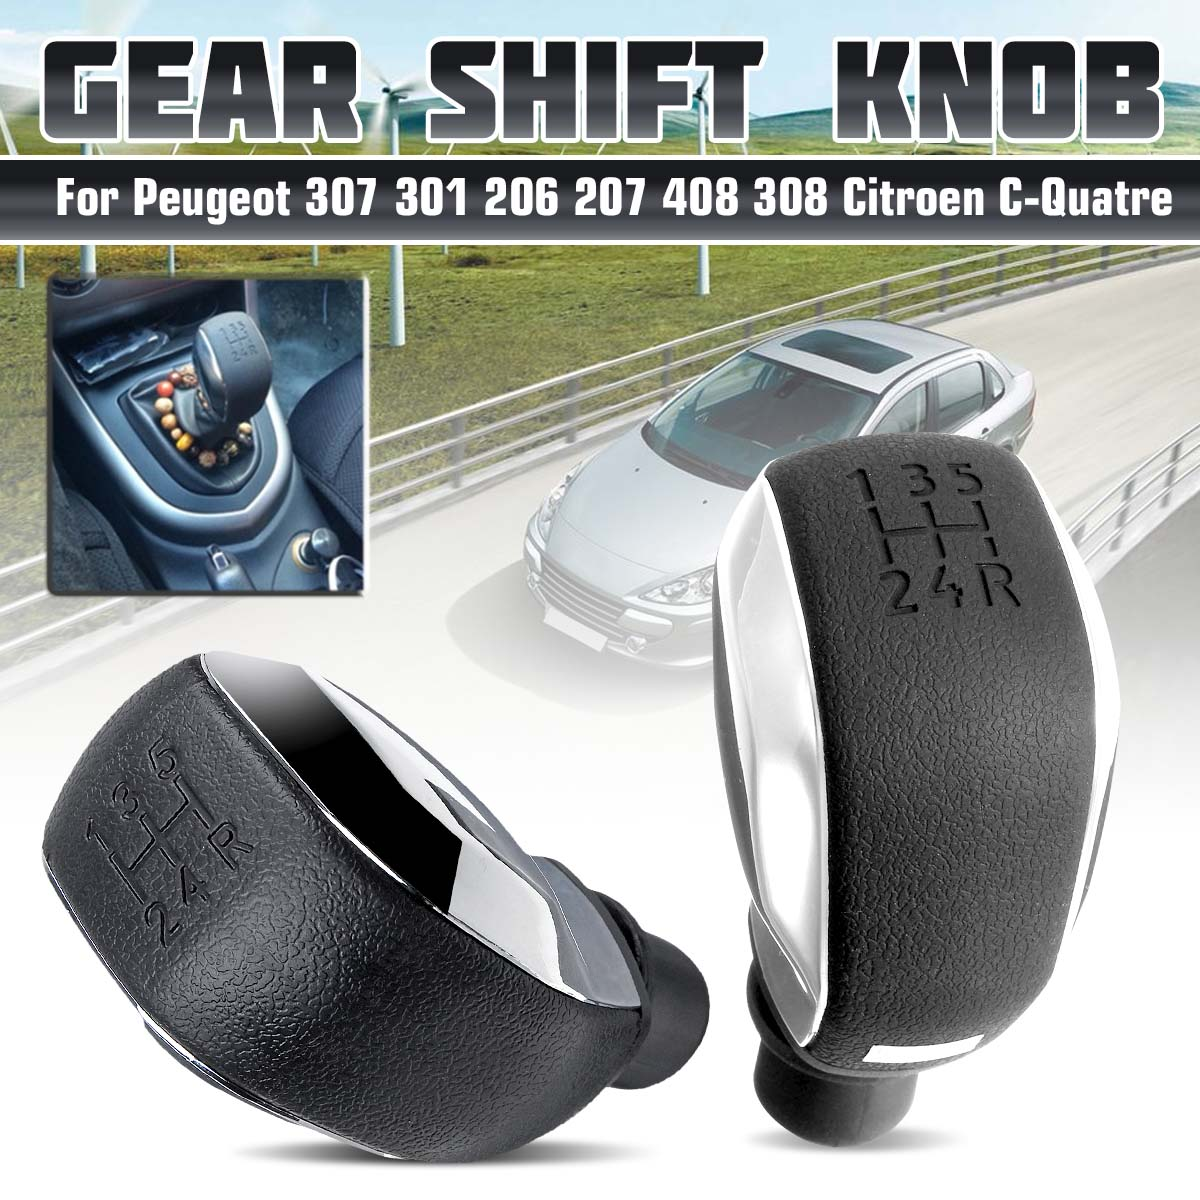 MT 5 Speed Gear Shift Knob For Peugeot 306 307 301 206 207 408 308 508 2008 C4L C2 For Citroen C-Quatre C-Triomphe Elysee